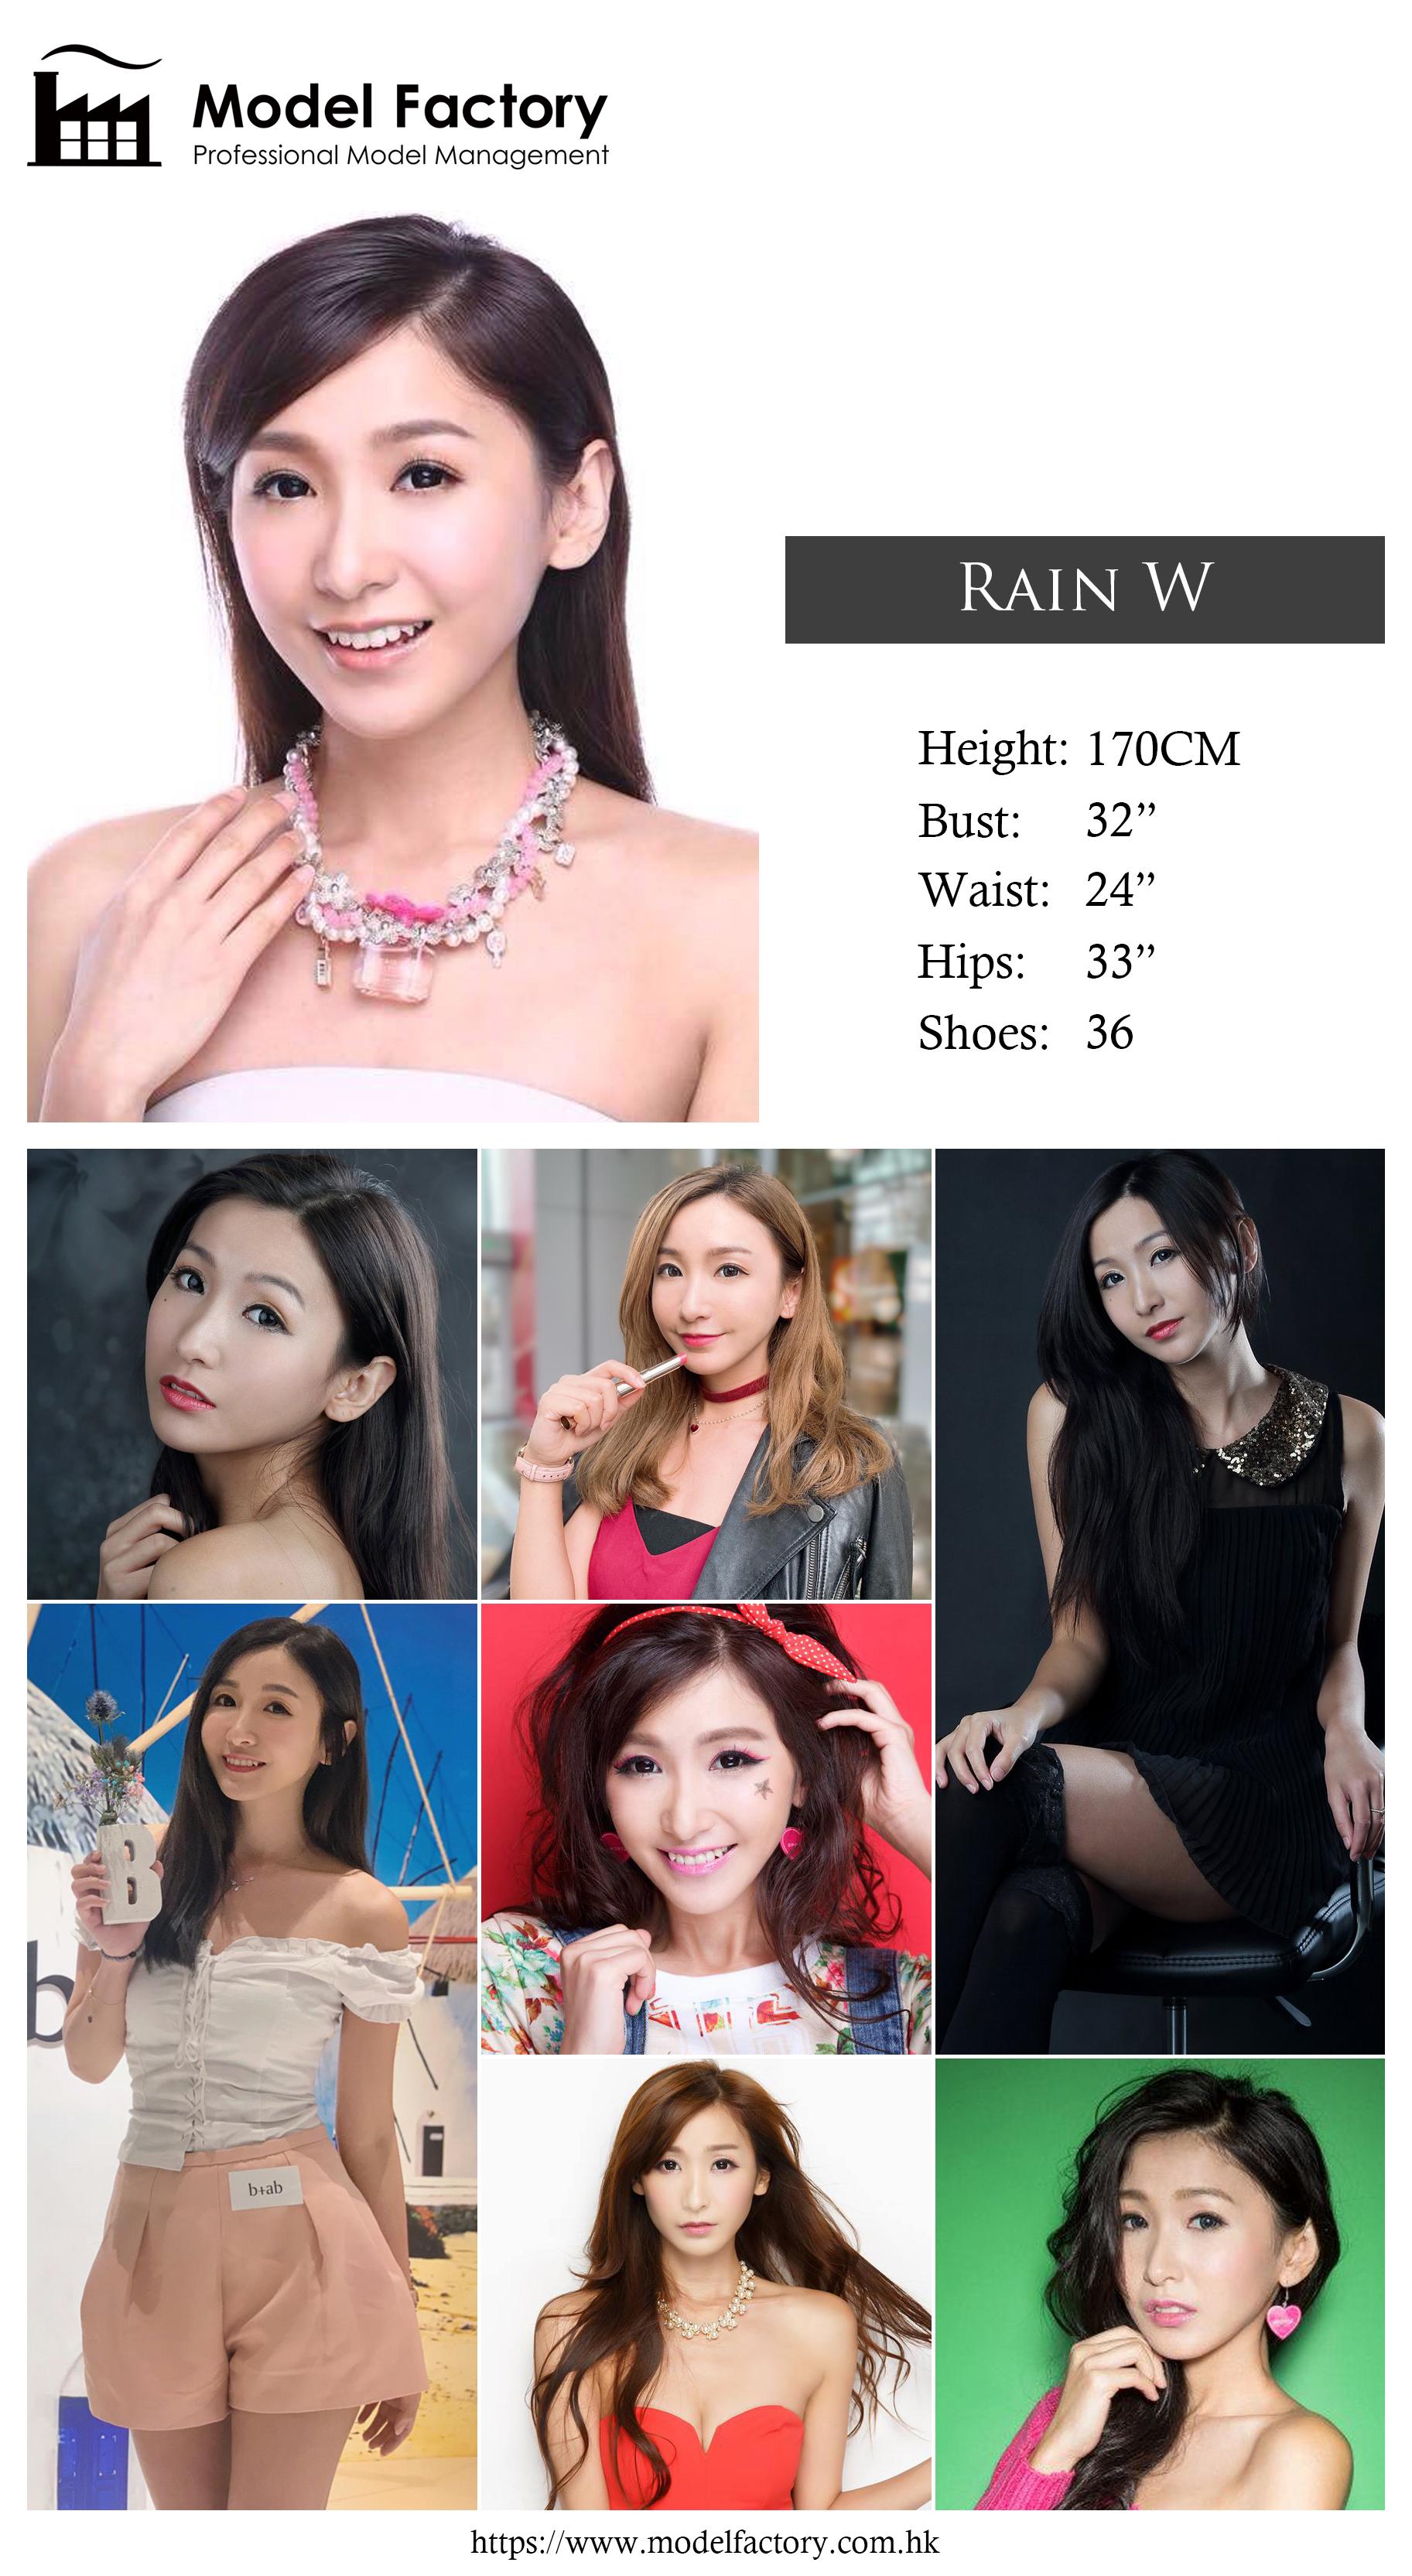 Model Factory Hong Kong Female Model RainW